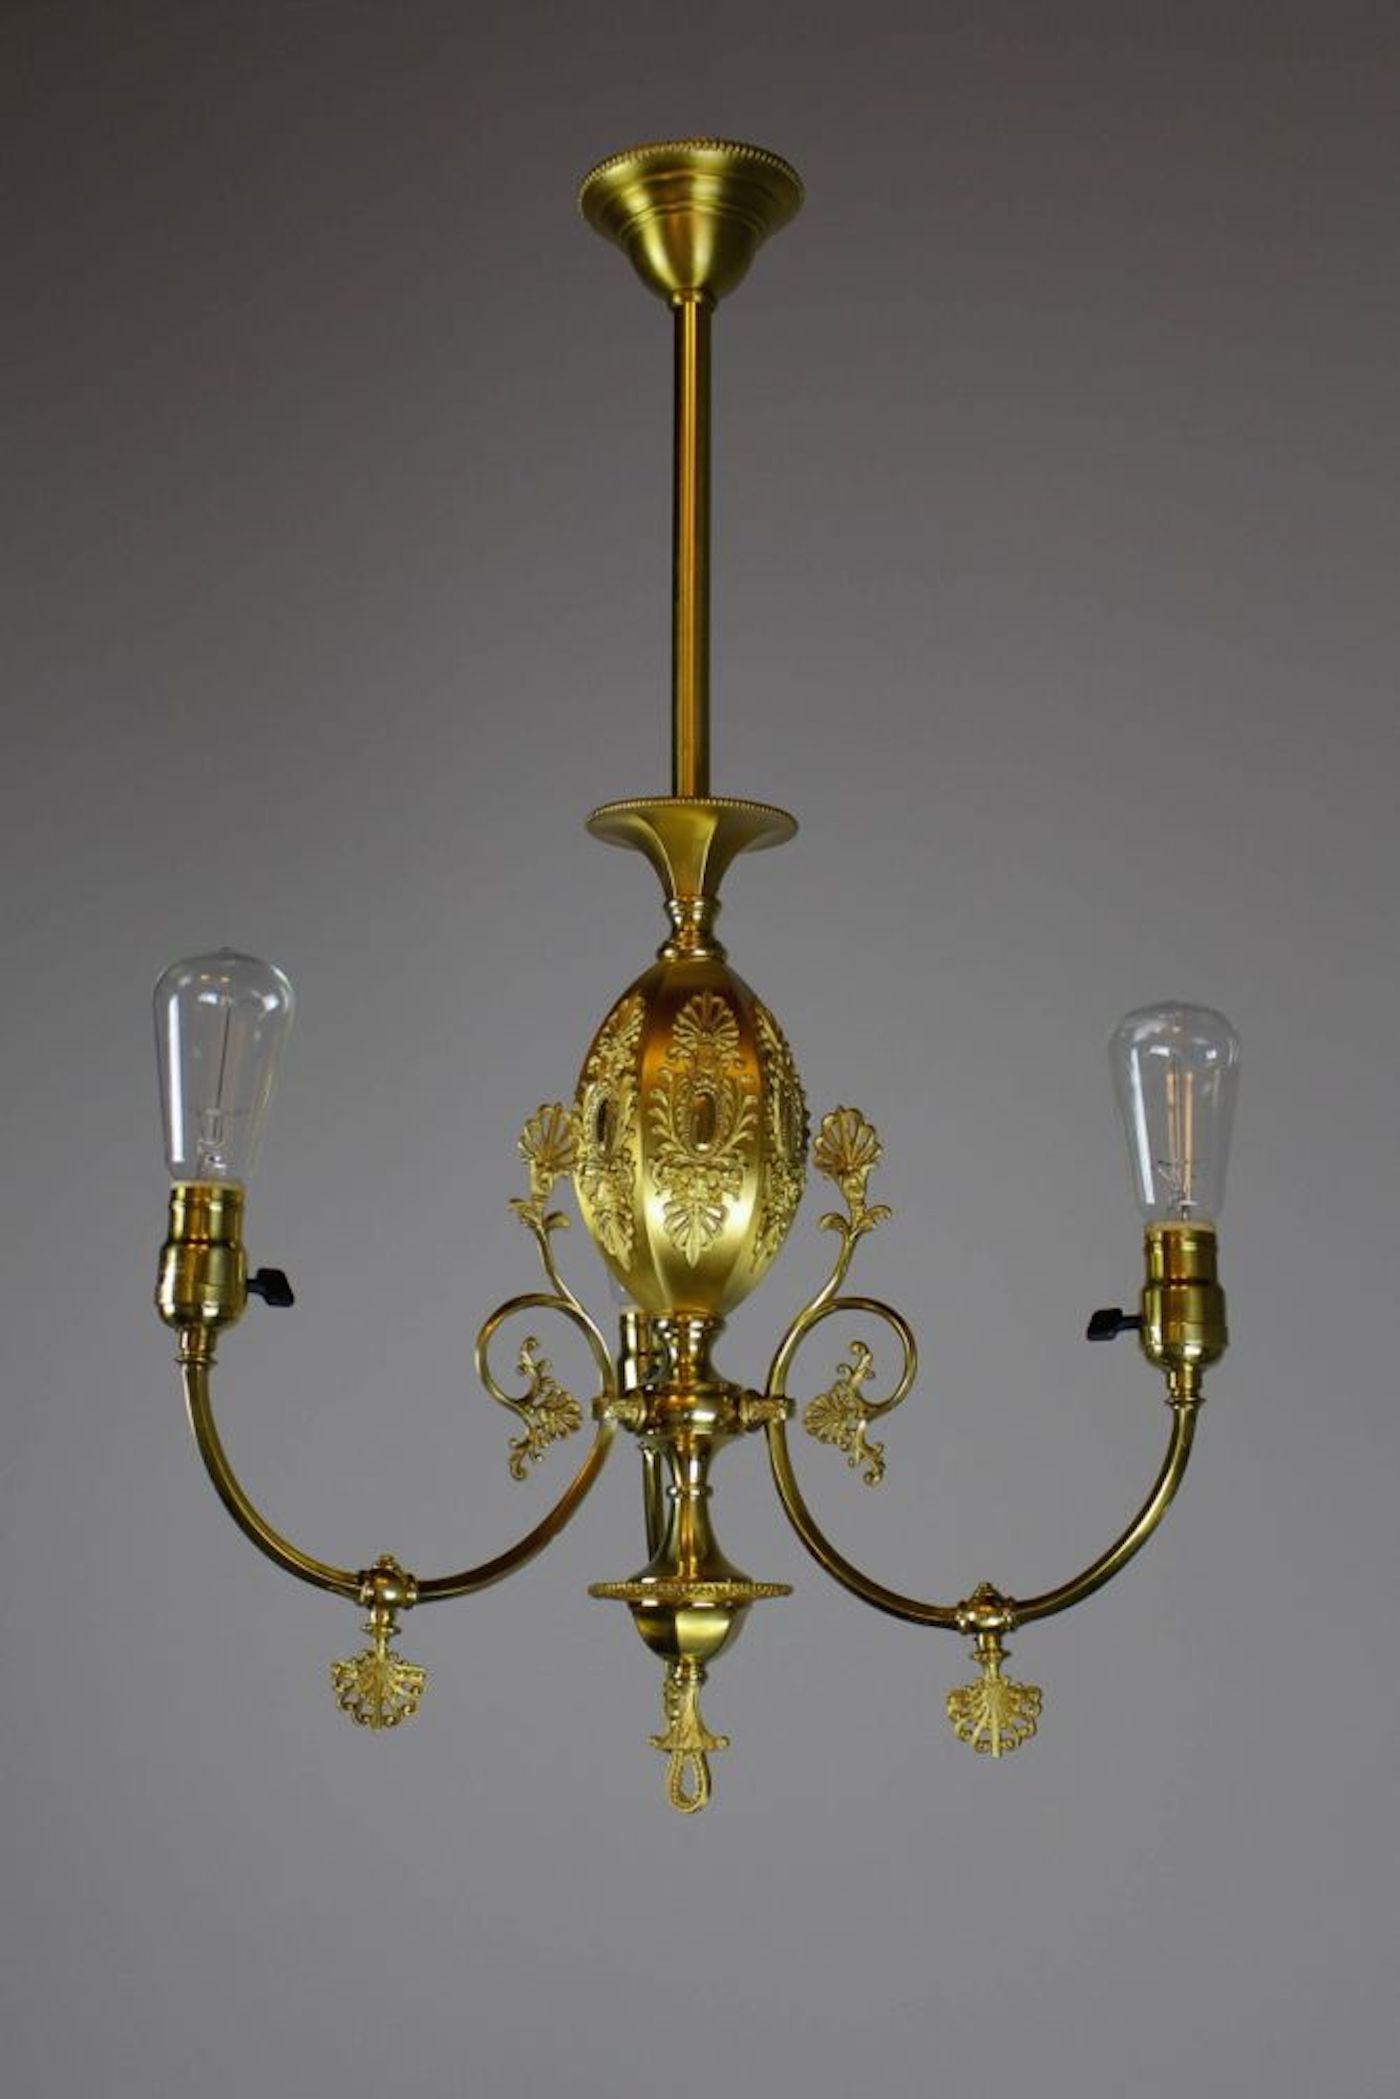 R williamson co chicago decorative victorian converted gas fixture 3 light renew gallery - Decorative light fixtures ...